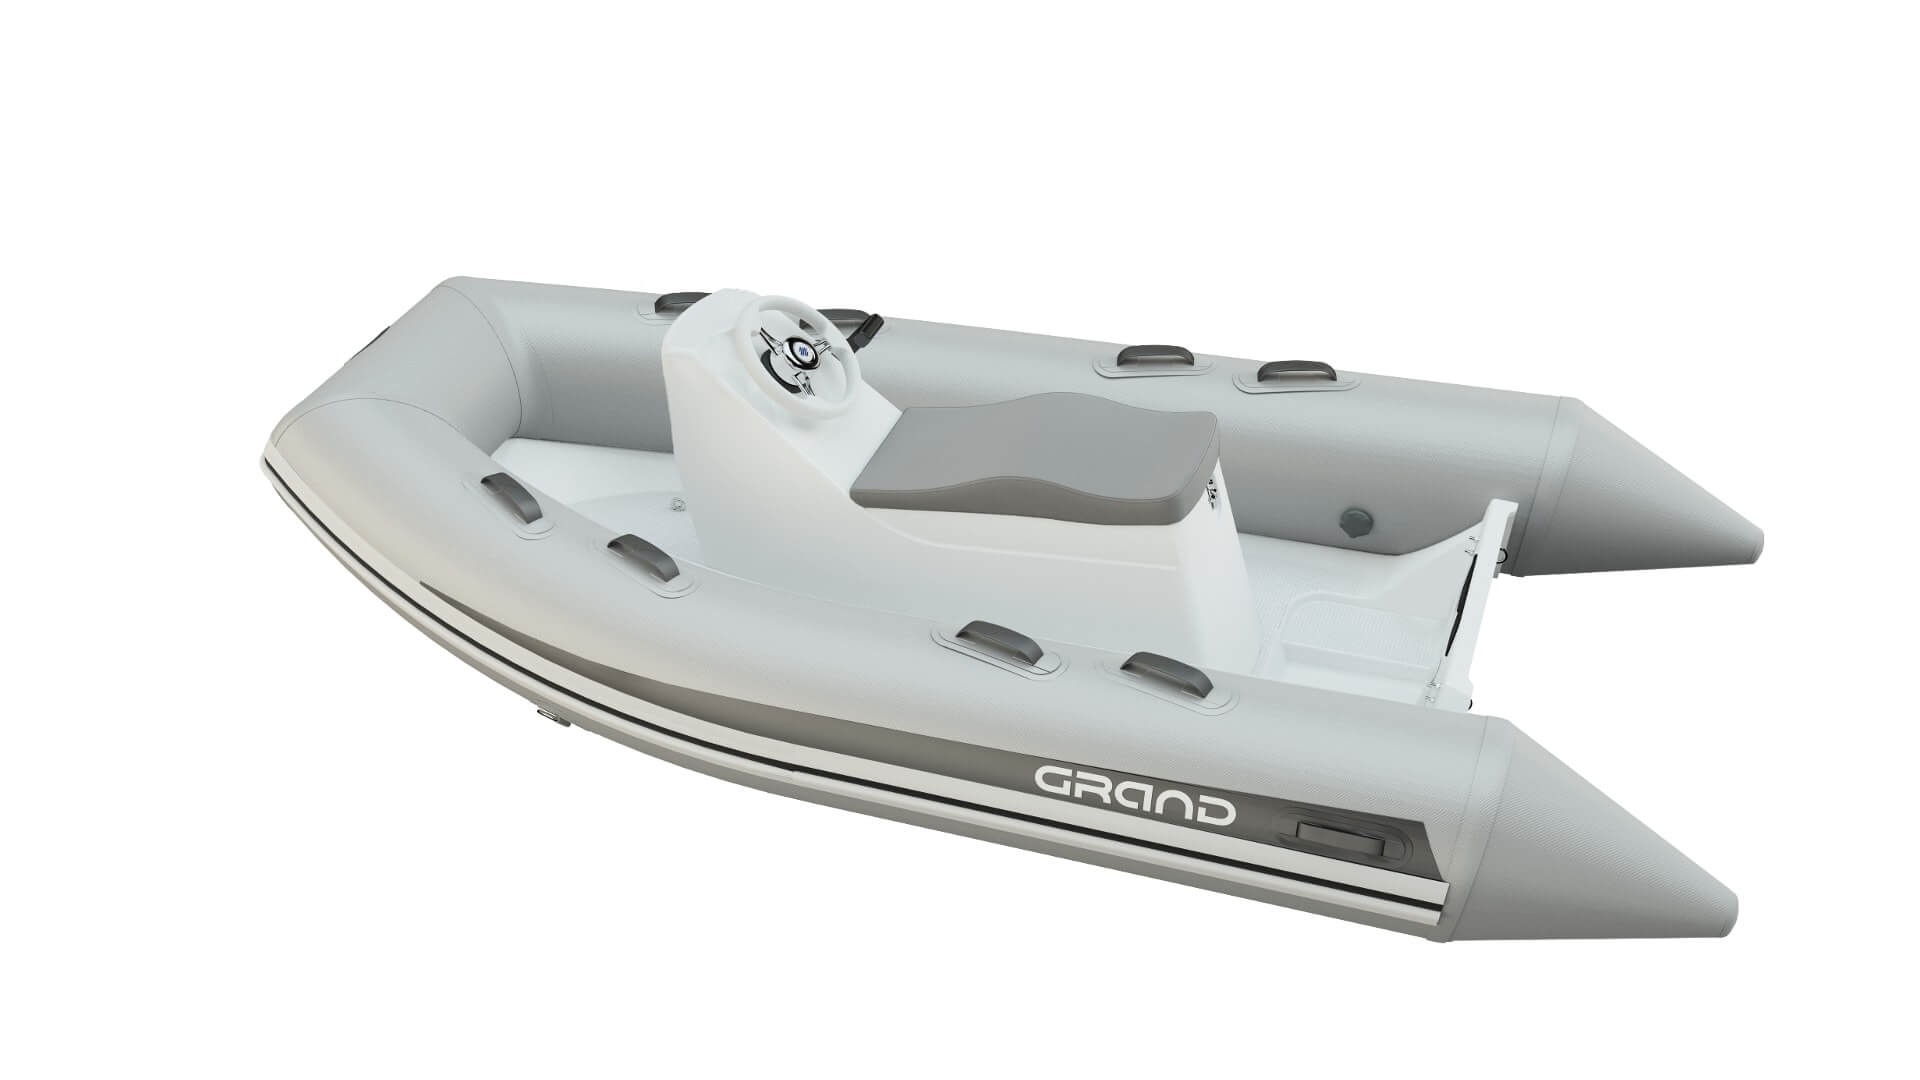 Надувная лодка с жестким дном GRAND Silver Line S330S, Надувная лодка GRAND Silver Line S330S, GRAND Silver Line S330SF, GRAND Silver Line S330S, GRAND S330SF, GRAND S370S, GRAND S370, Надувная лодка GRAND, Надувная лодка ГРАНД, Надувная лодка с жестким дном, RIB, Rigid Inflatable Boats